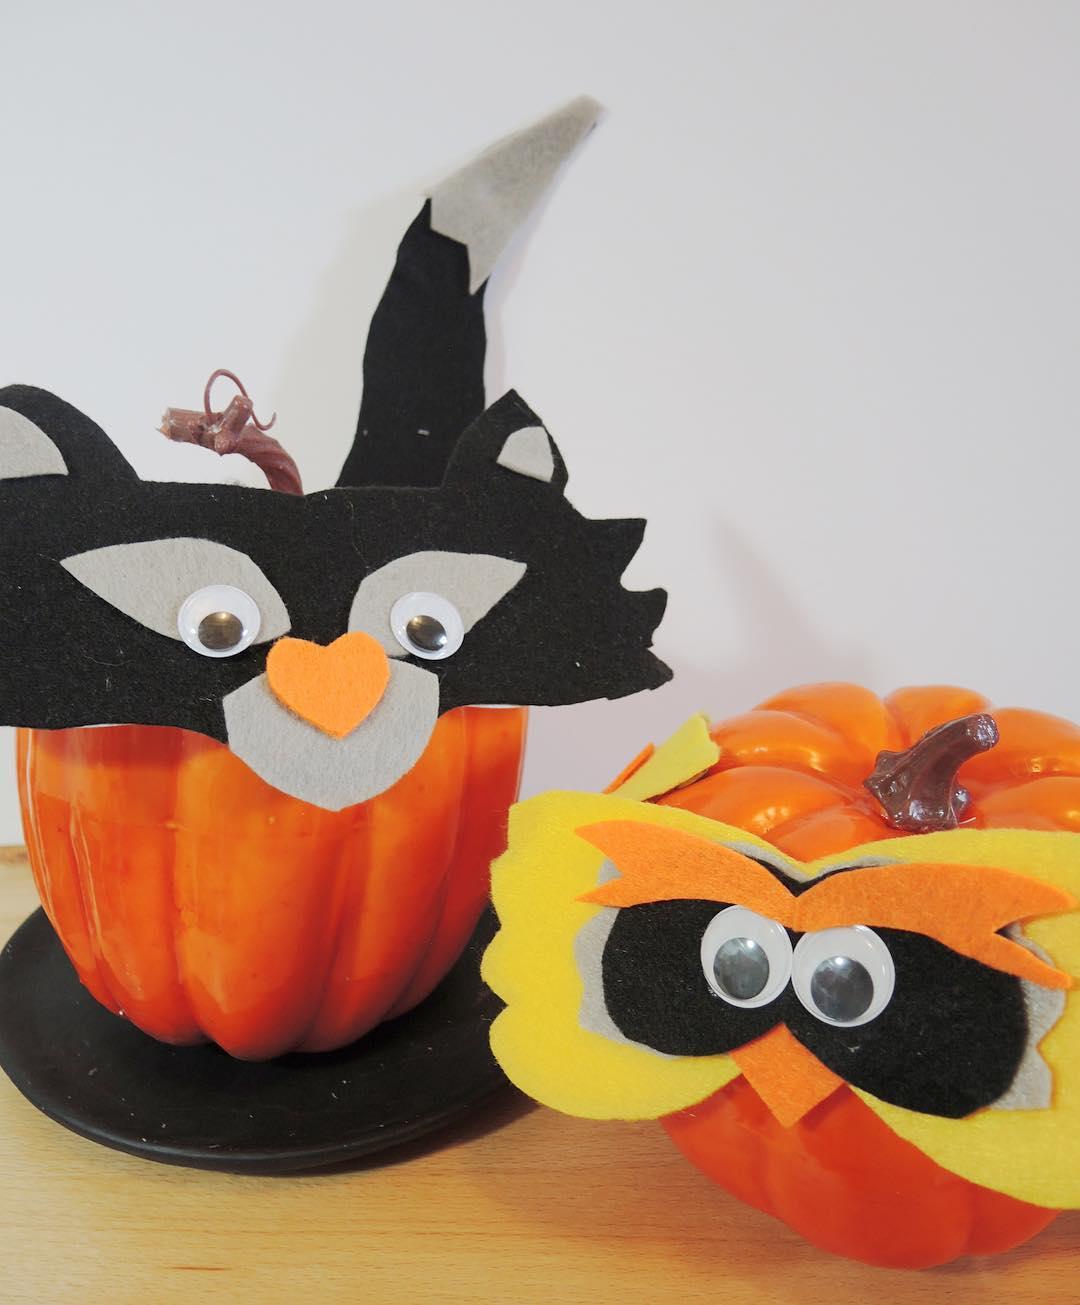 DIY Halloween pumpkin decor. Pic by samlovesarts